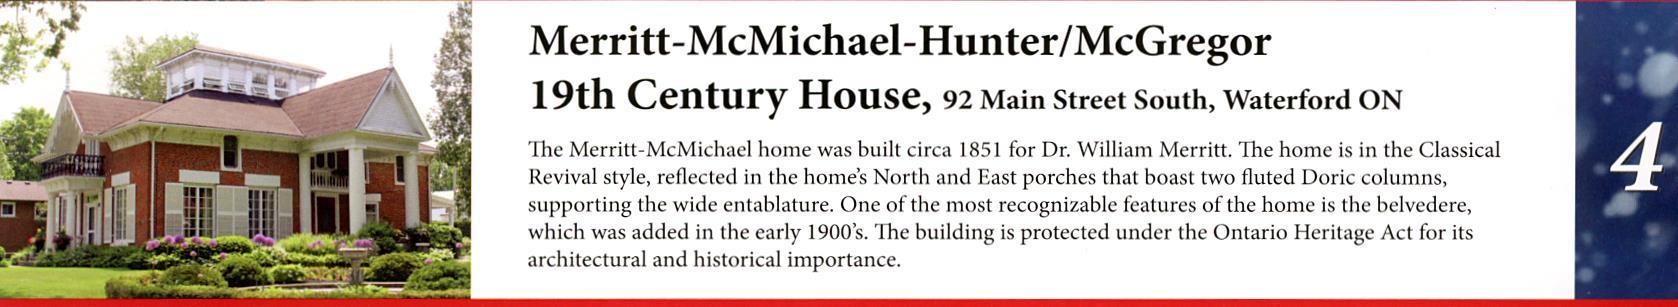 Merritt-McMichael-Hunter/McGregor 19th Century Home